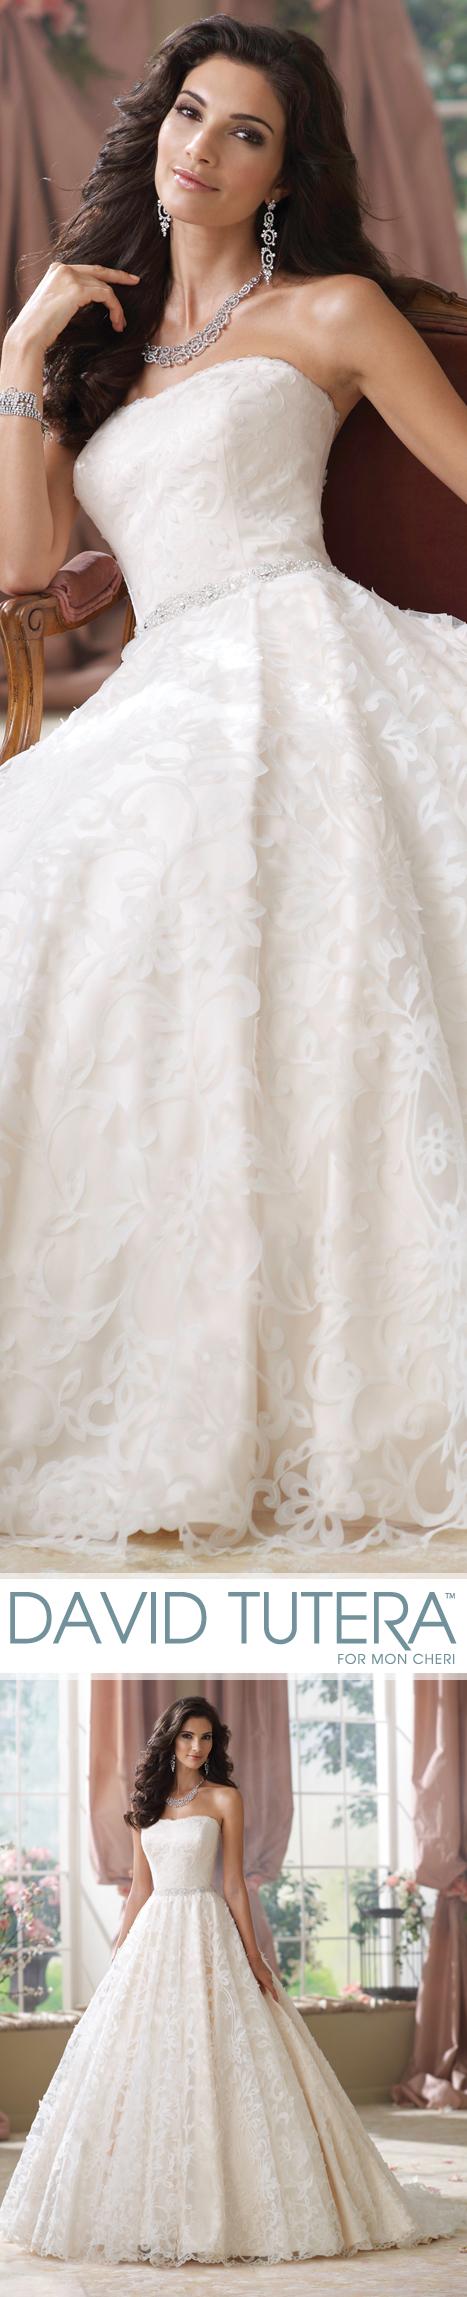 Wedding dress jewelry  Style No   Mary Lou Wedding Dresses  Collection u David